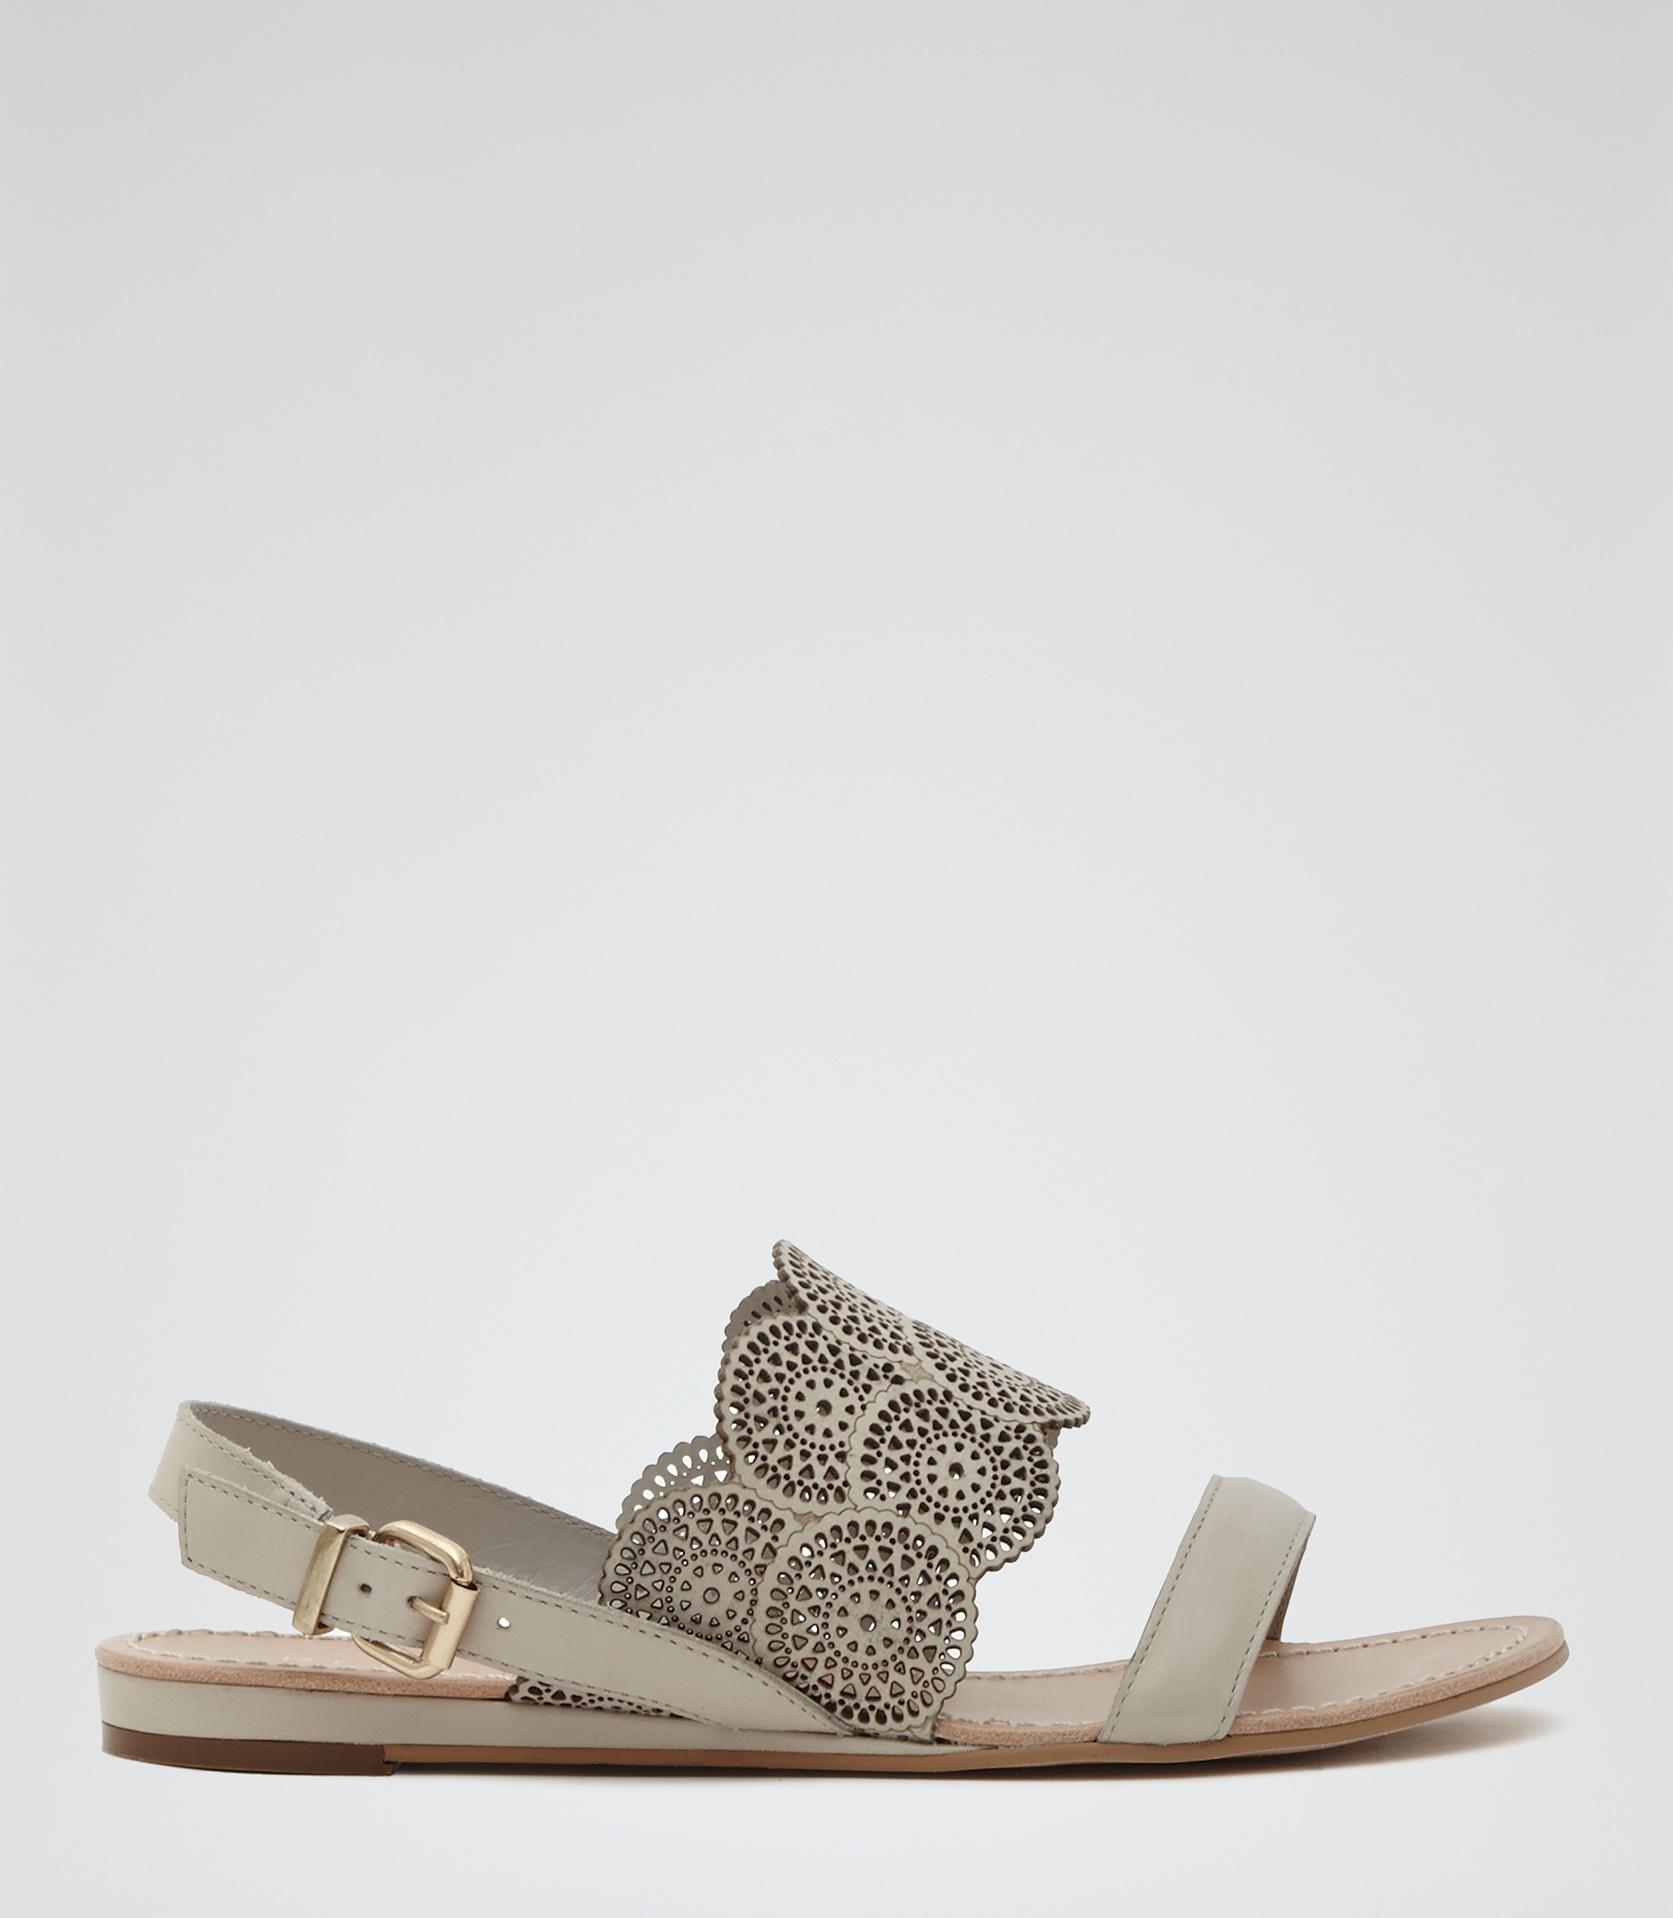 540590392e02 Lyst - Reiss Cordoba Laser-cut Flat Sandals in White